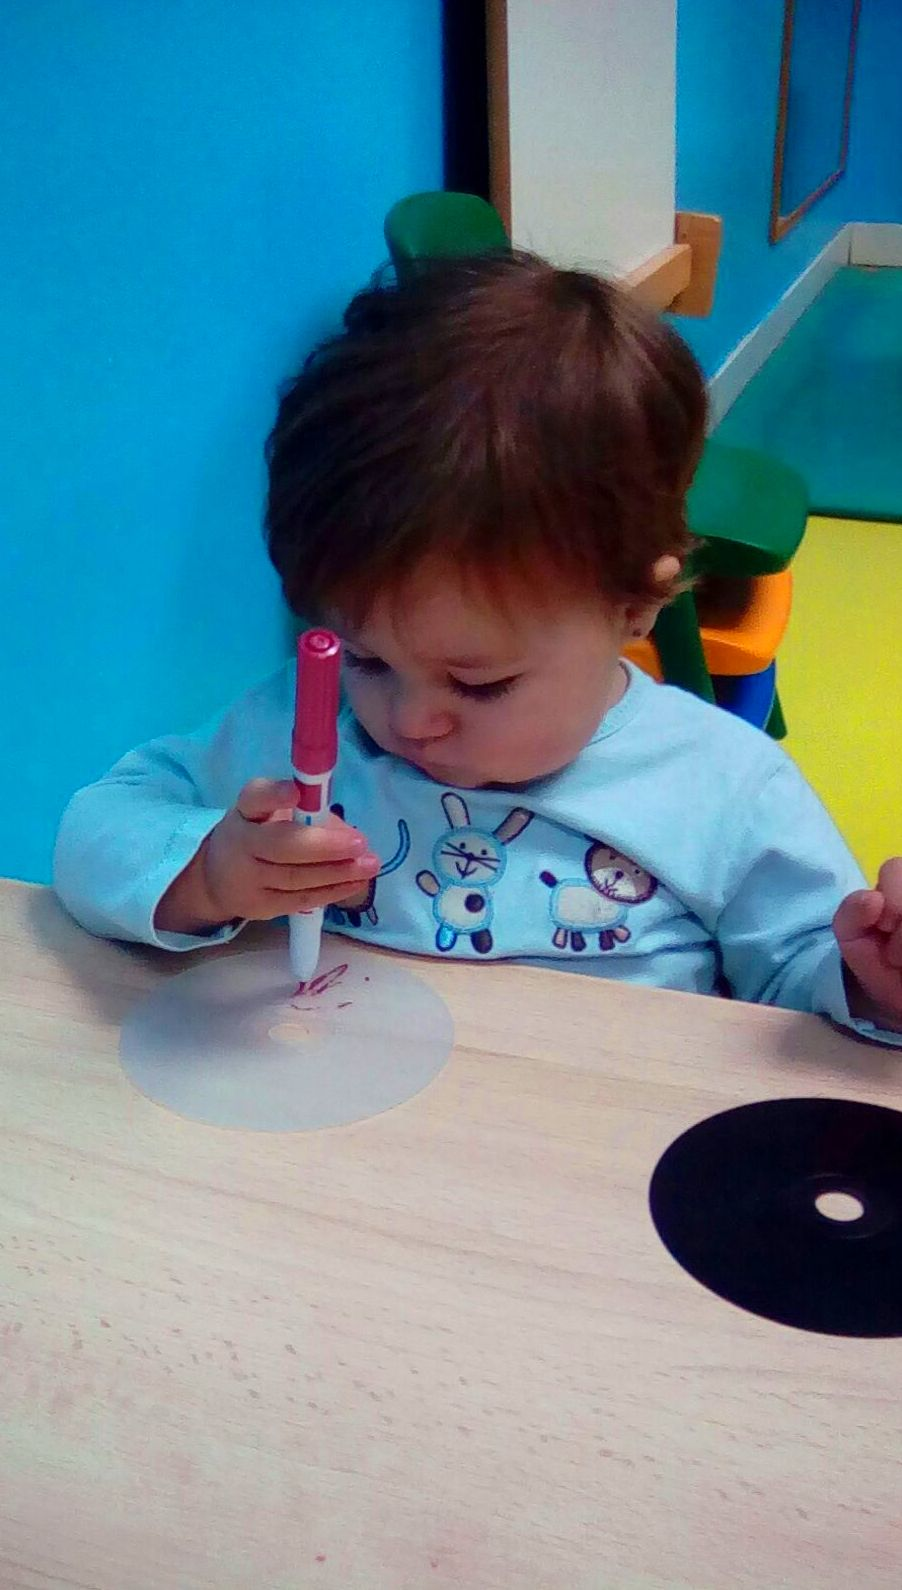 Picture 23 of Escuela infantil in Algete | E.I. Cuatro Pecas de Colores